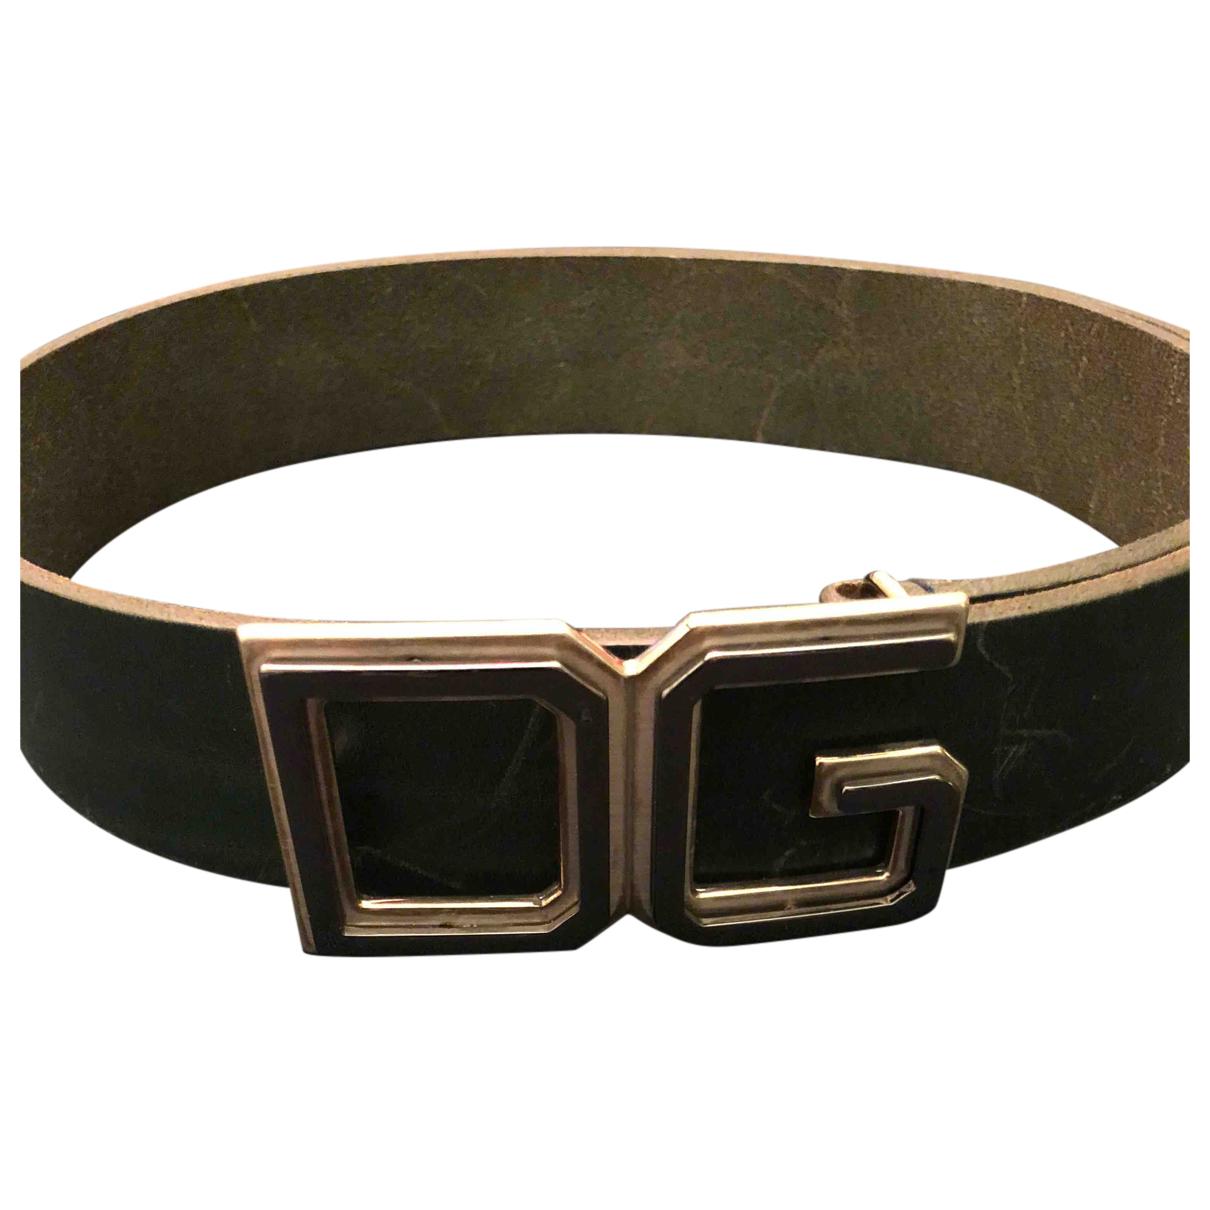 Dolce & Gabbana N Green Leather belt for Men 100 cm